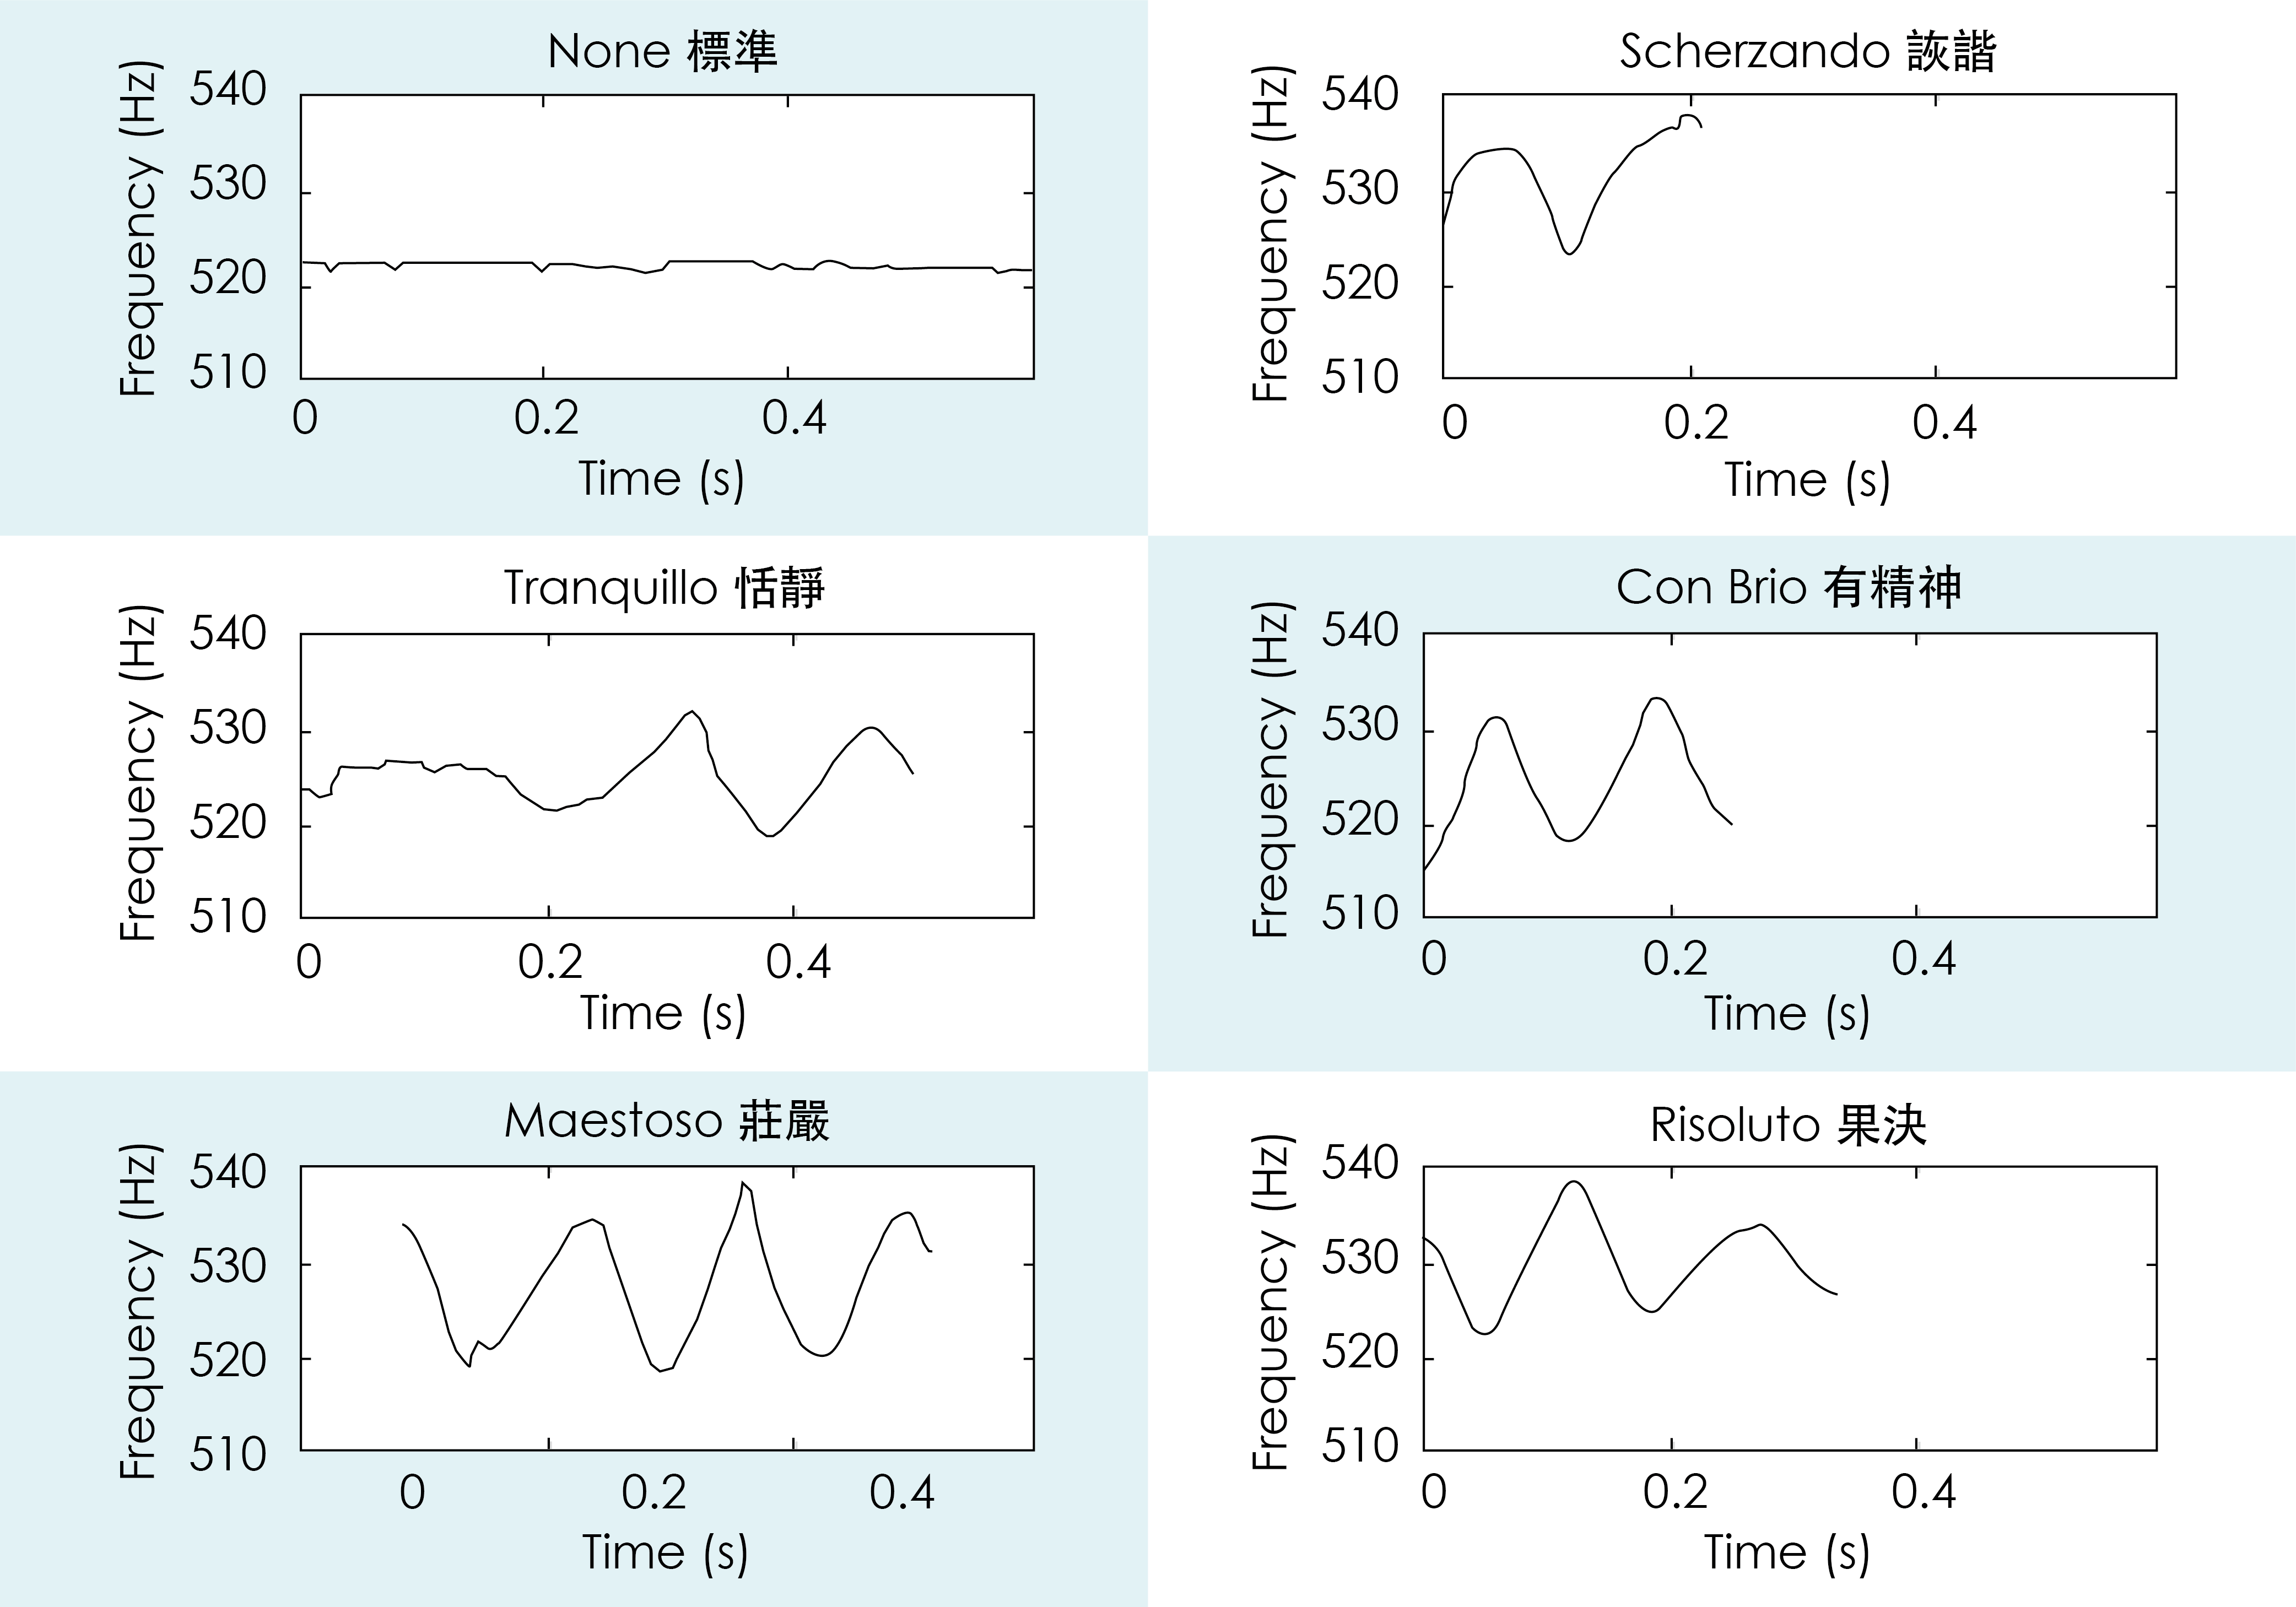 此圖為小星星的第一個 Do 音在不同音樂情緒的表現。每一個彈奏風格的聲音變化,都可以被明確記錄下來,抓到彈奏要點。 資料來源│Analysis of expressive musical terms in violin using score-informed and expression-based audio features 圖片重製│張凱鈞、張語辰